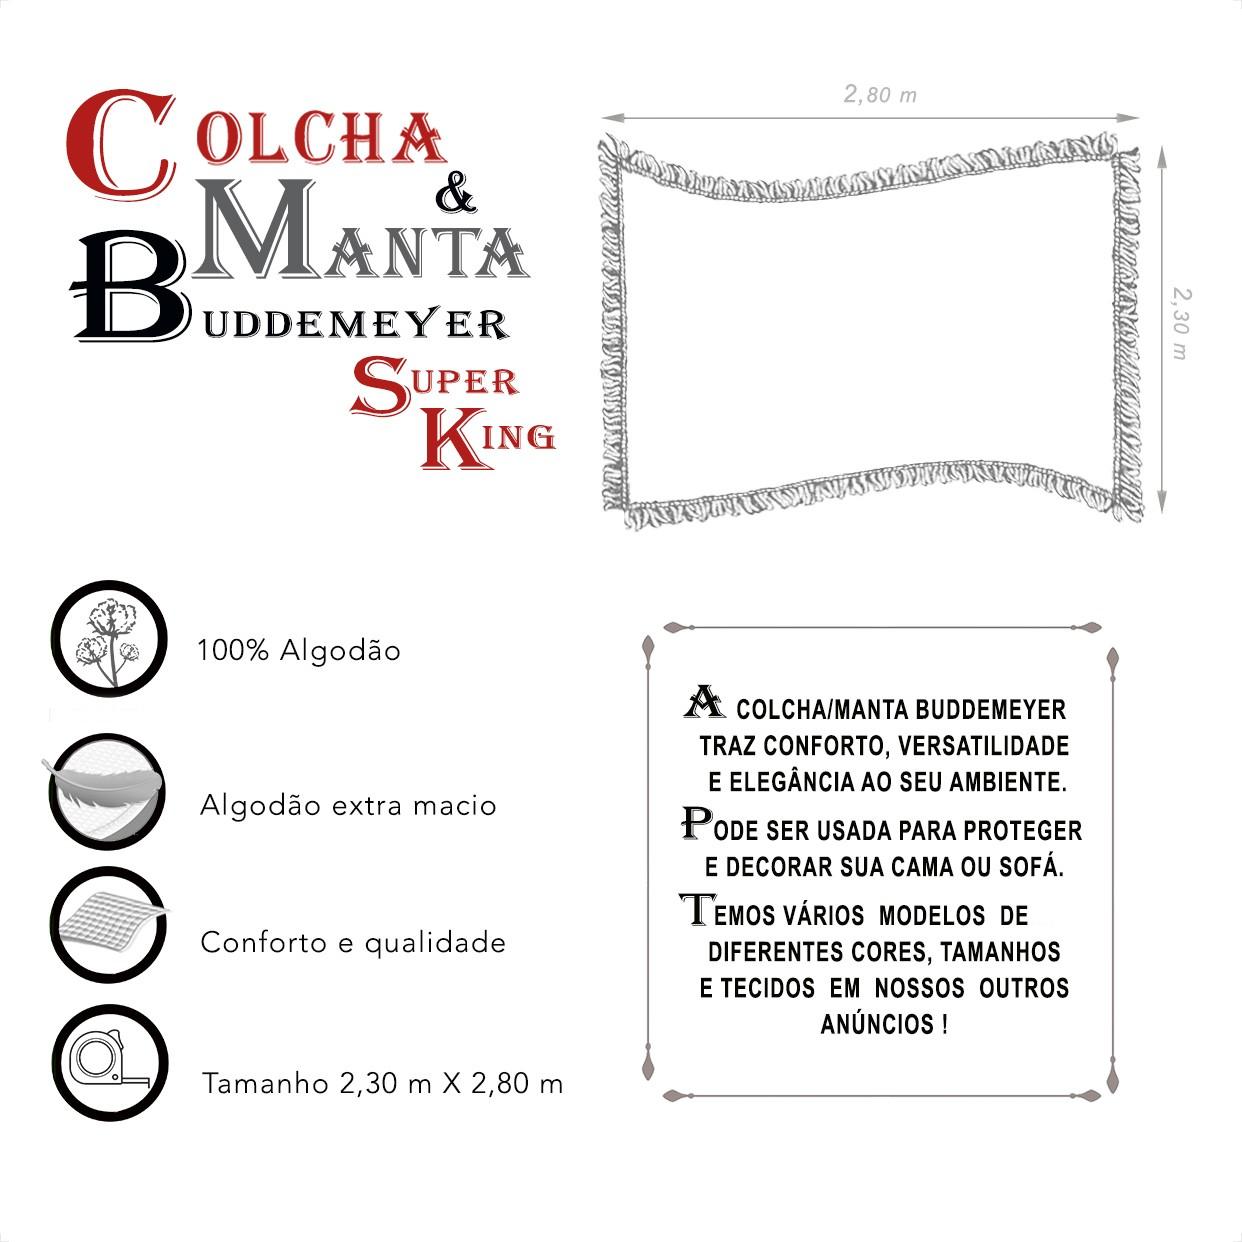 Manta e Colcha Buddemeyer Super King Cinza Claro 2,30m x 2,80m